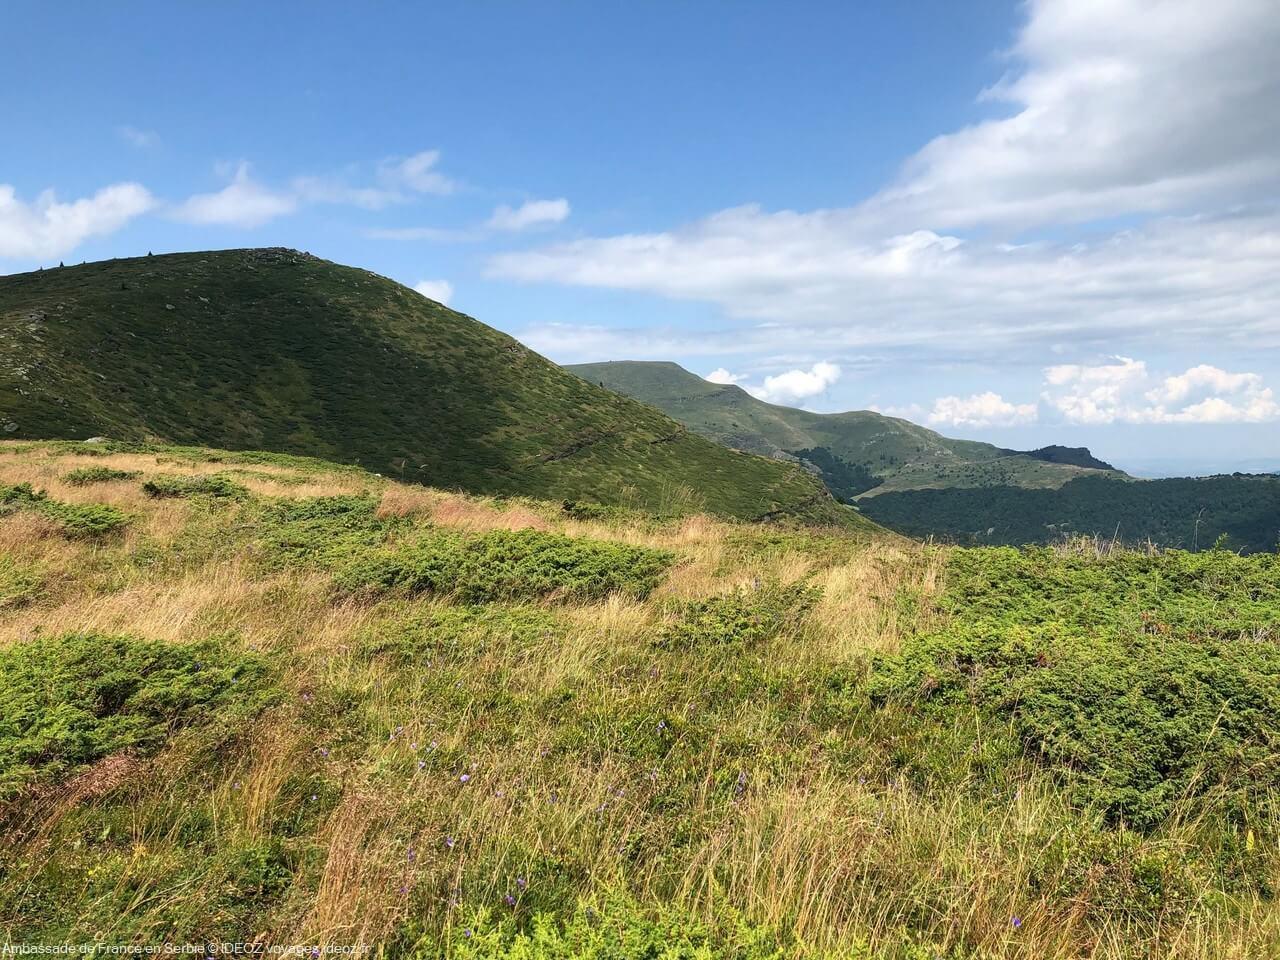 Randonnée à Stara Planina, sur la via dinarica voie verte en Serbie 11